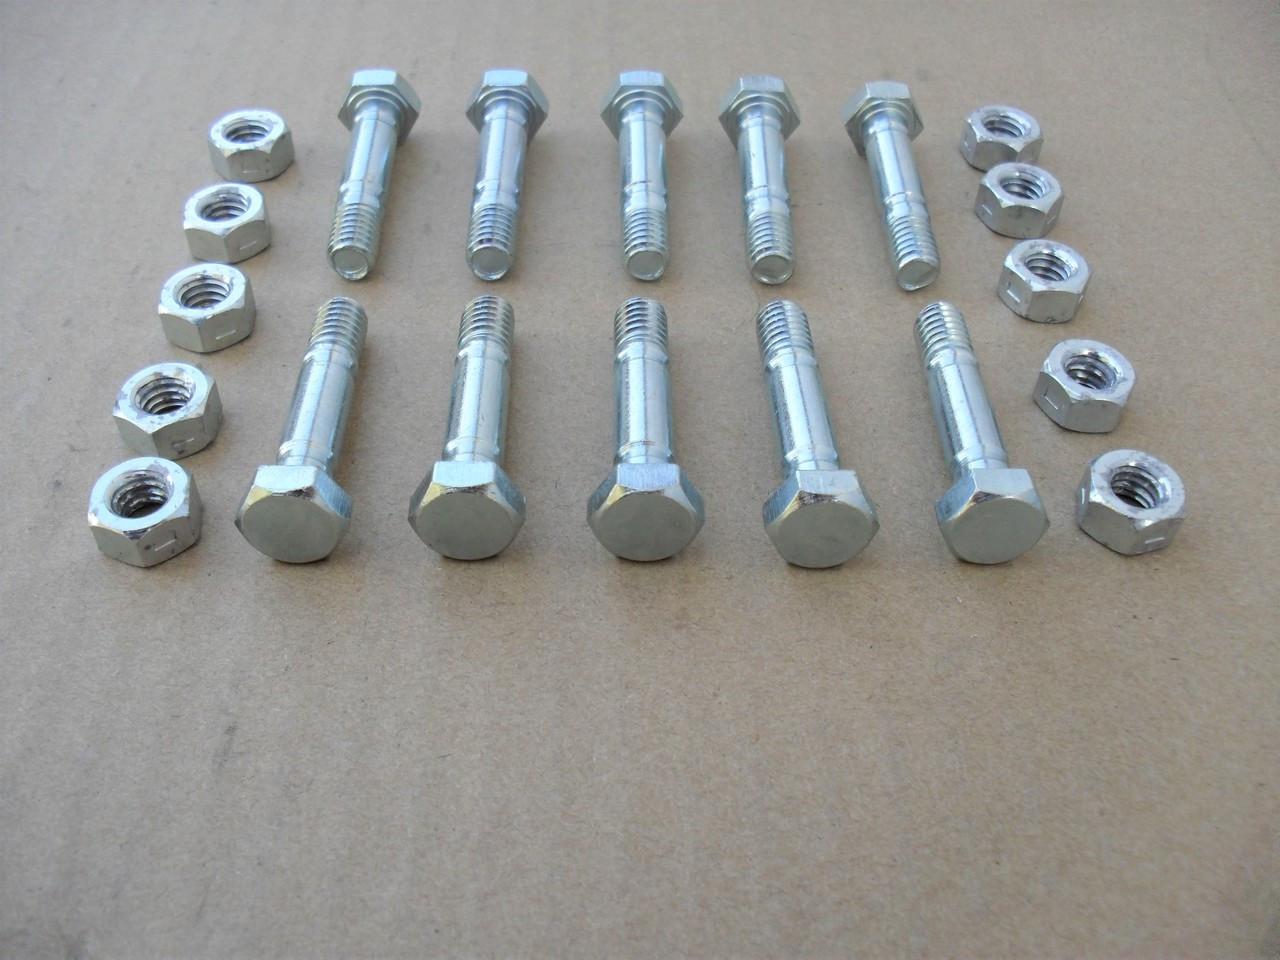 10 SHEAR PINS /& BOLTS fit Cub Cadet 724TE 724WE 826SWE 926STE 926SE Snowblower